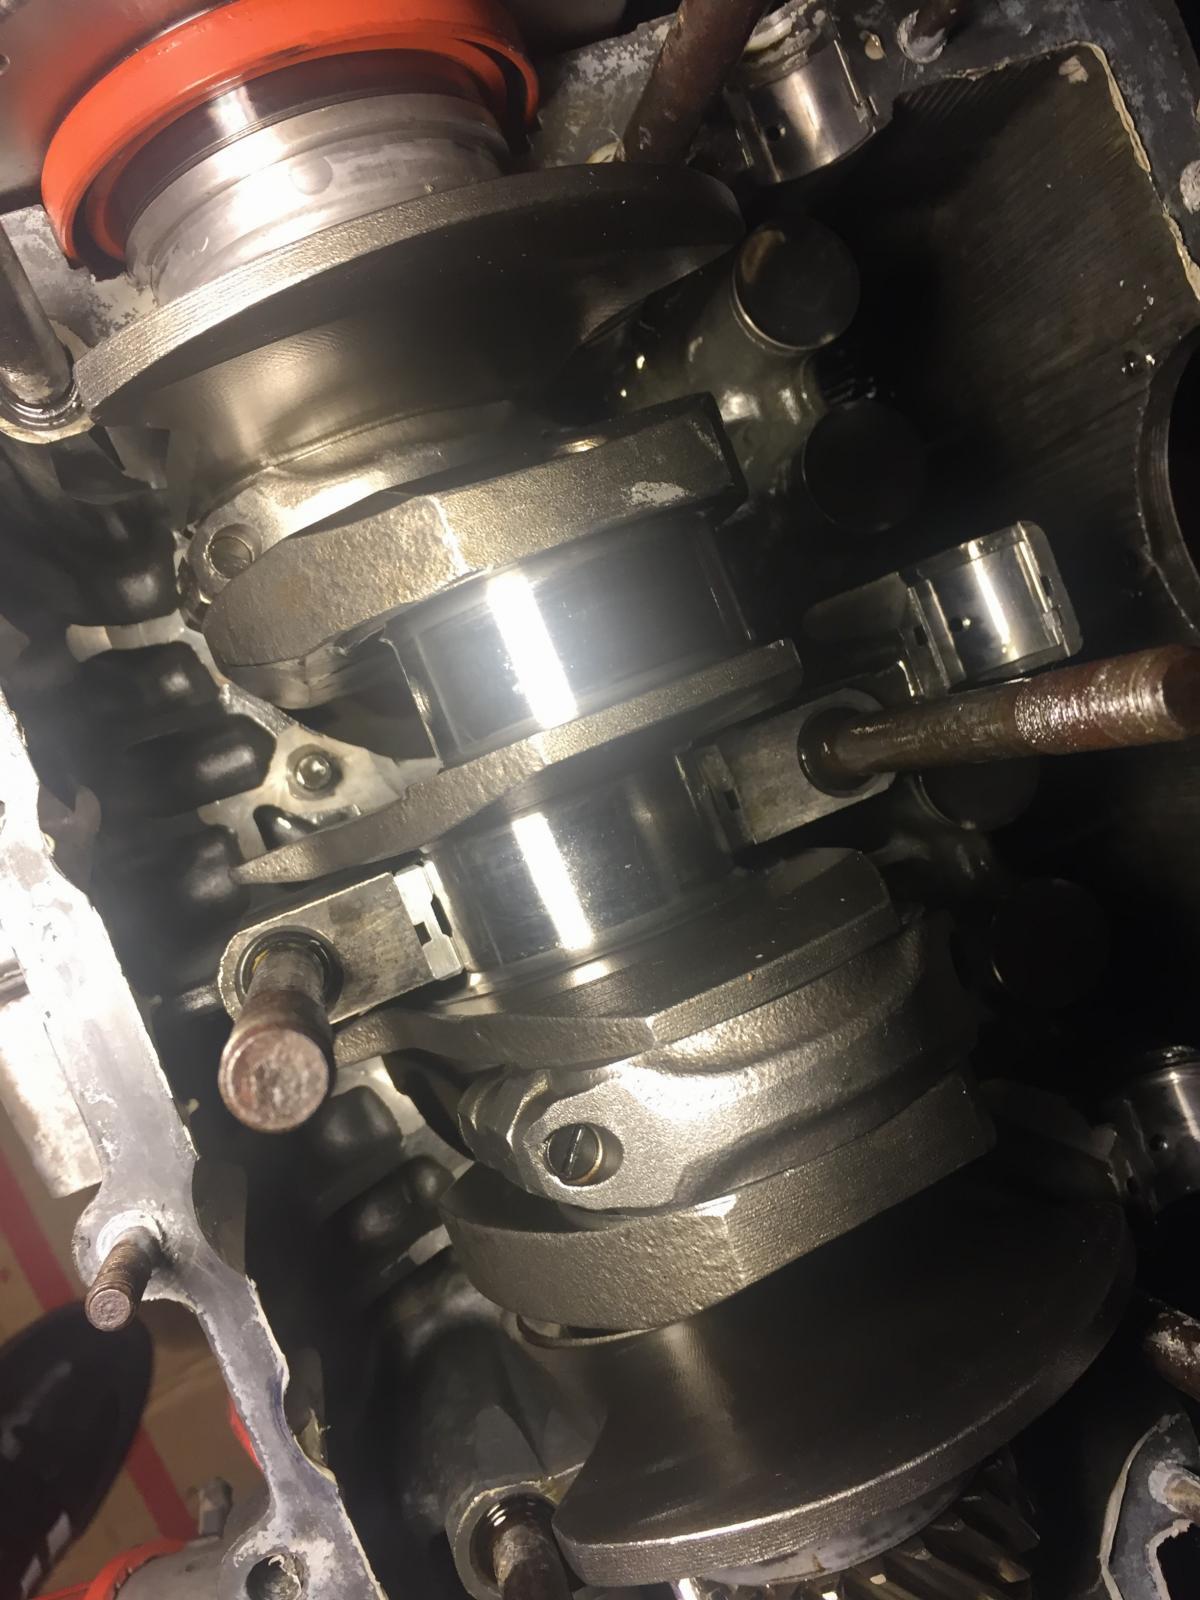 engine teardown.